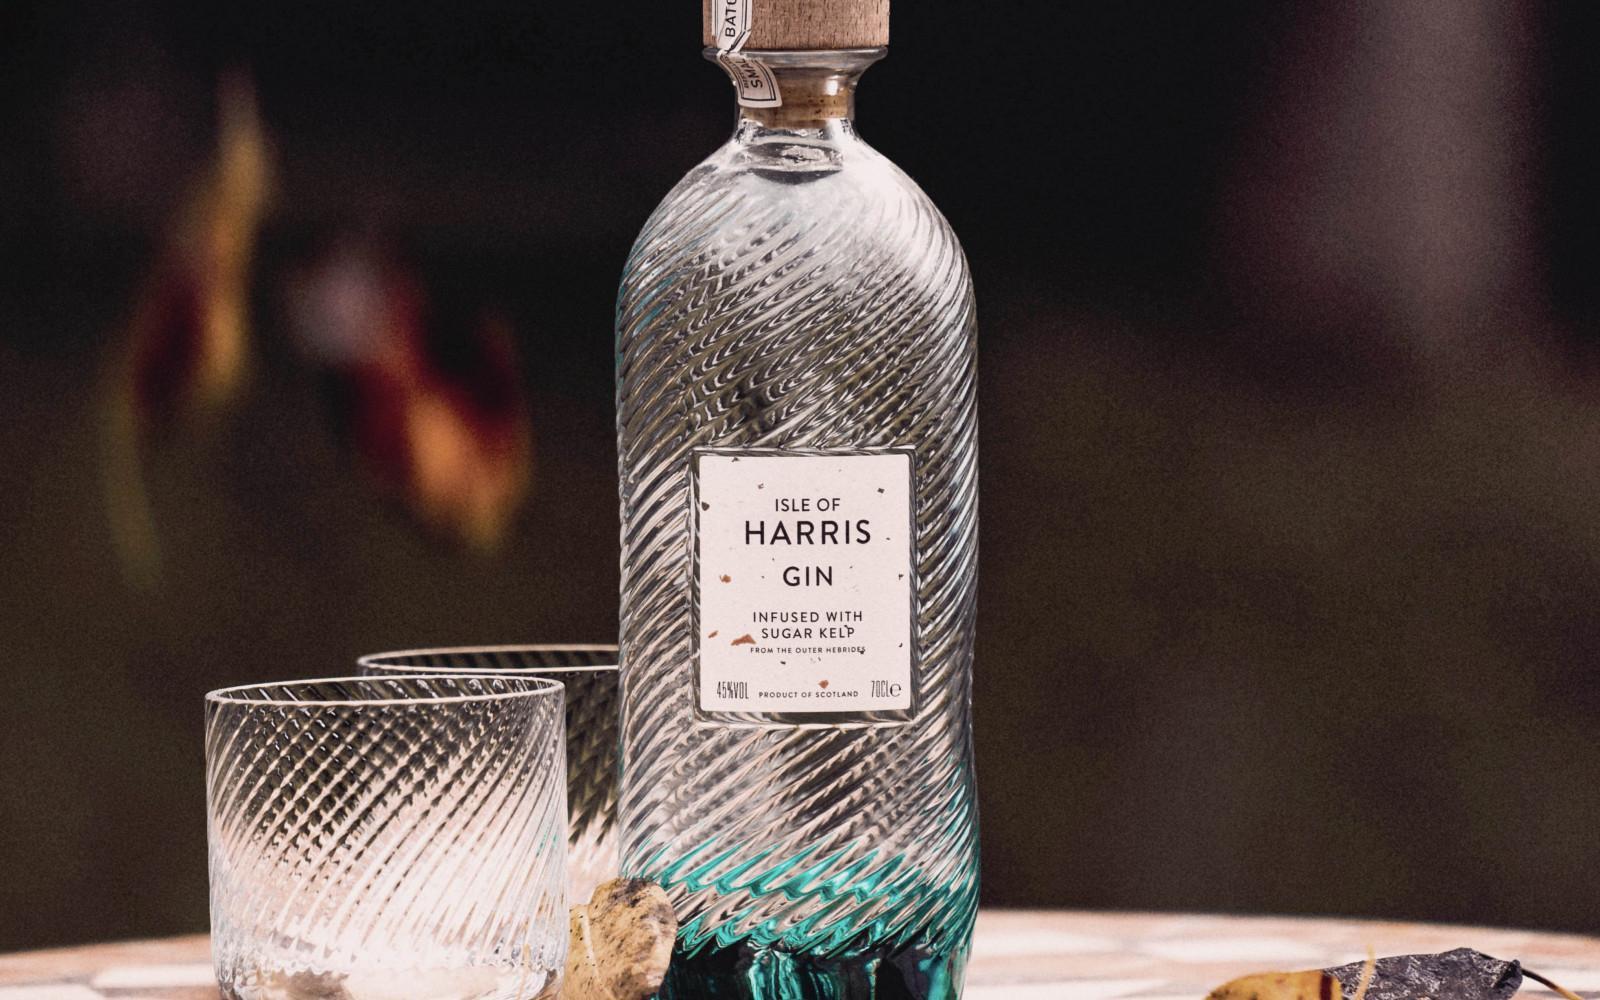 Isle of Harris Gin